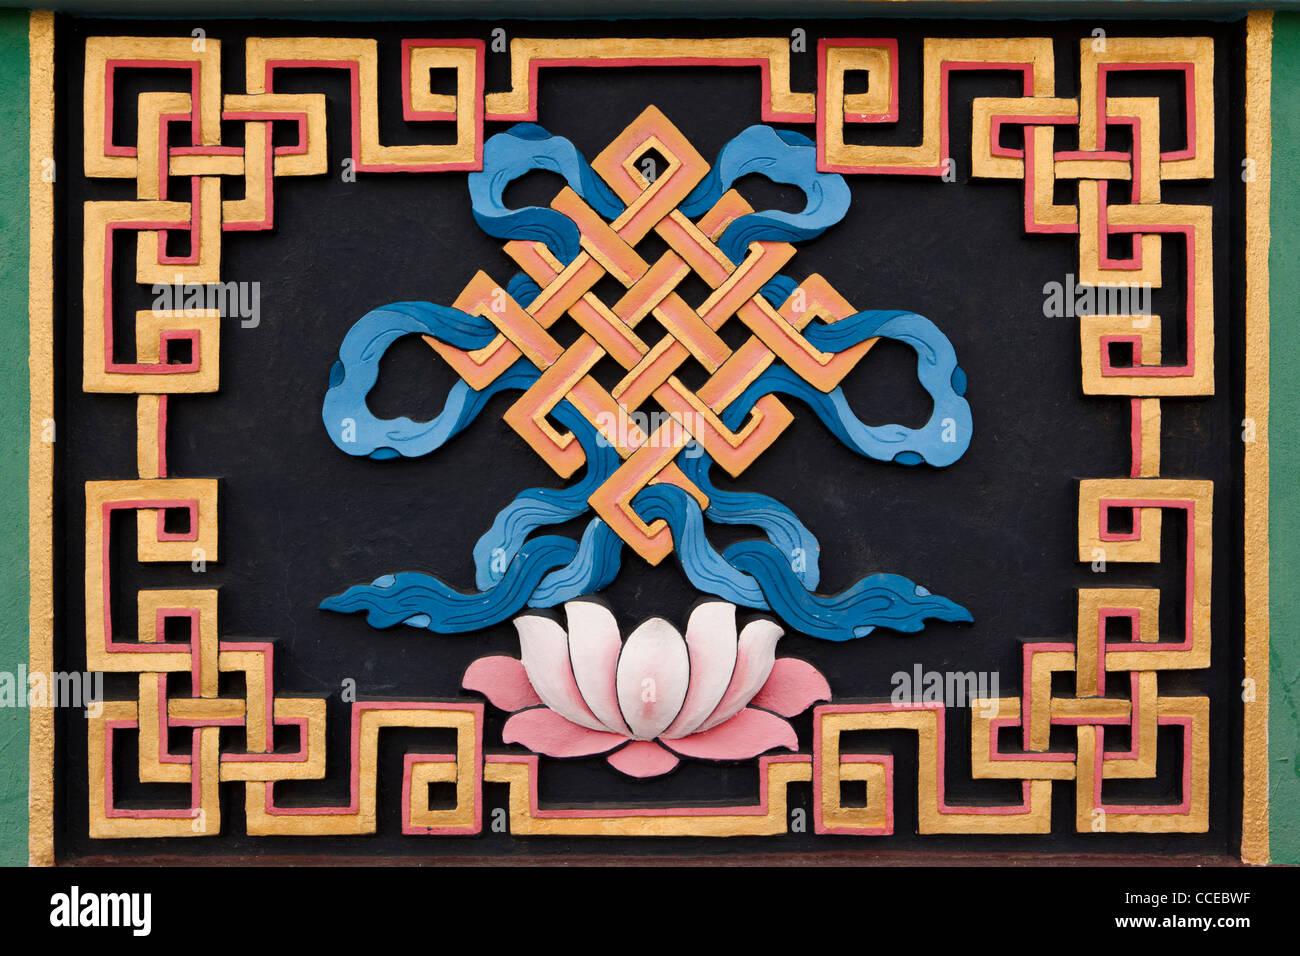 Indien, Arunachal Pradesh, Tawang, Khinmey Nyingma Kloster, Endless Knot, Shivastra, auspicious symbol Stockbild